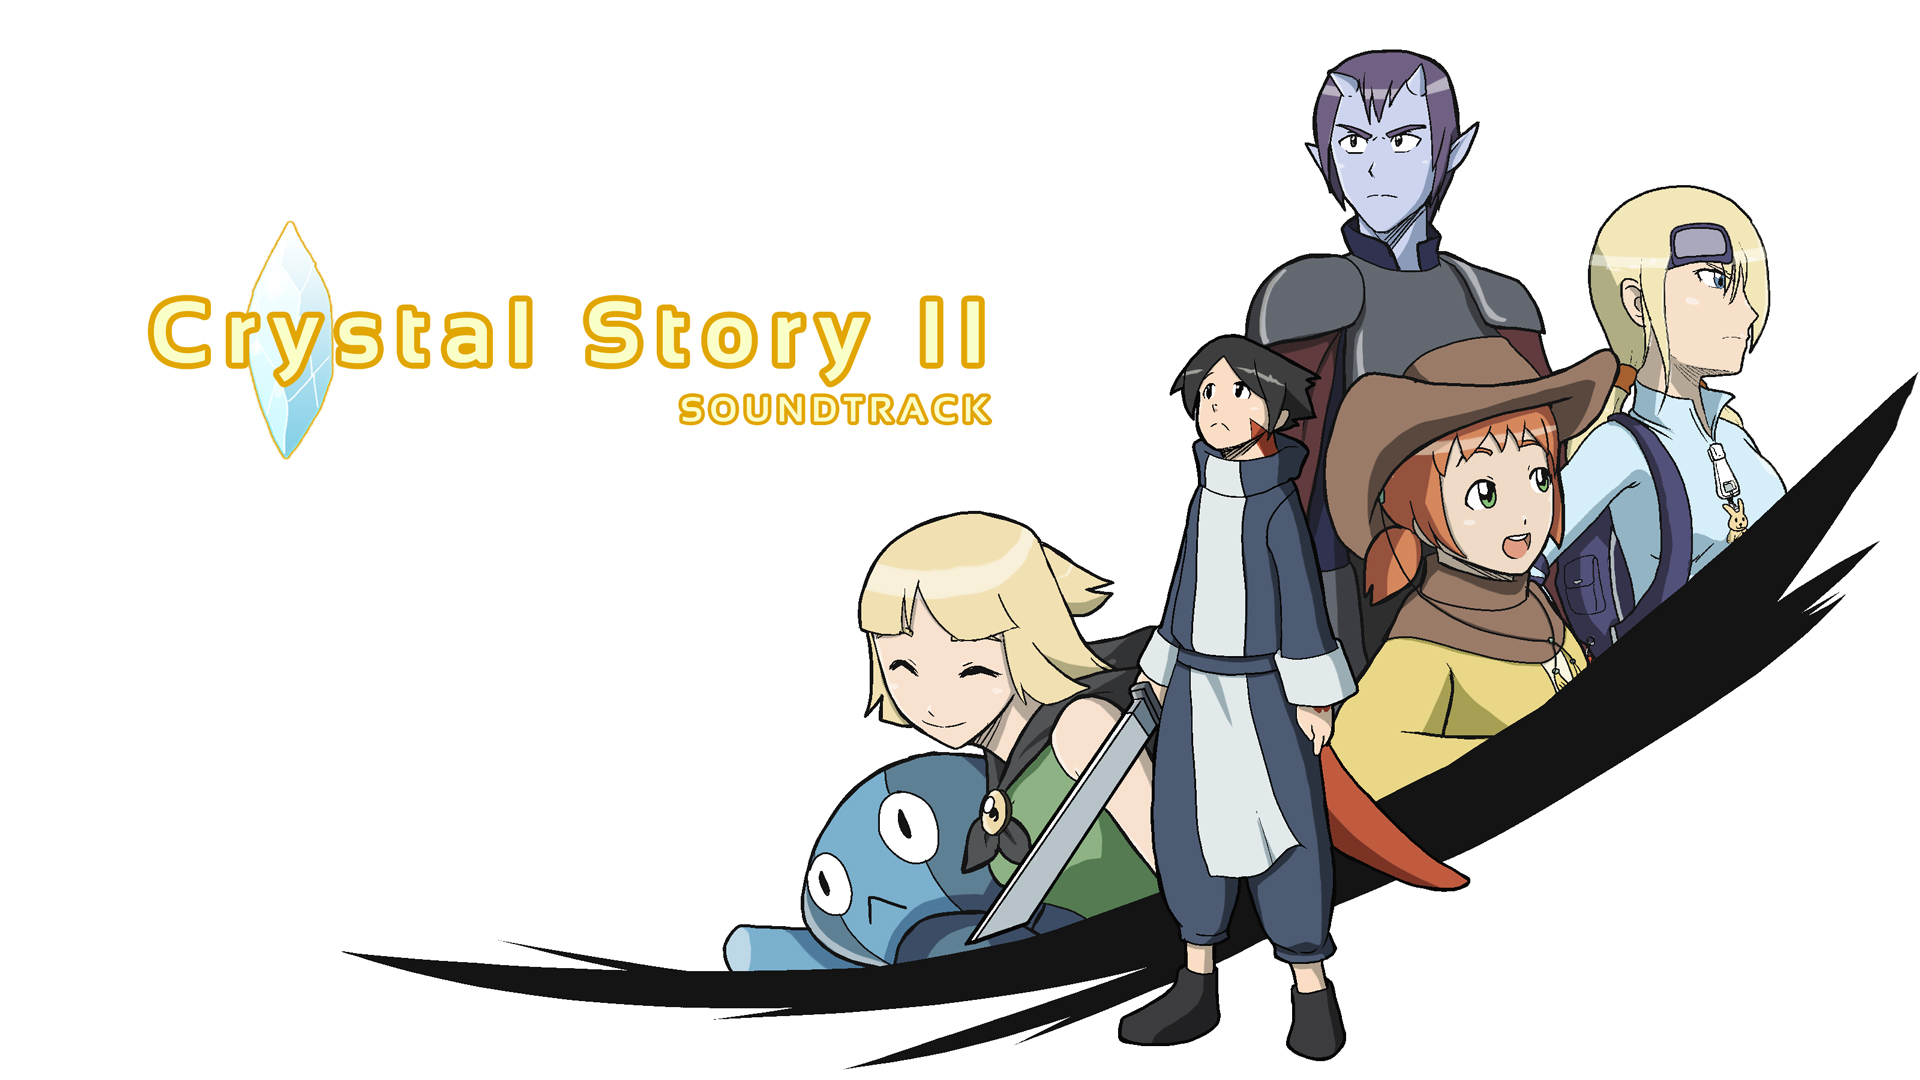 Crystal Story II - Soundtrack screenshot